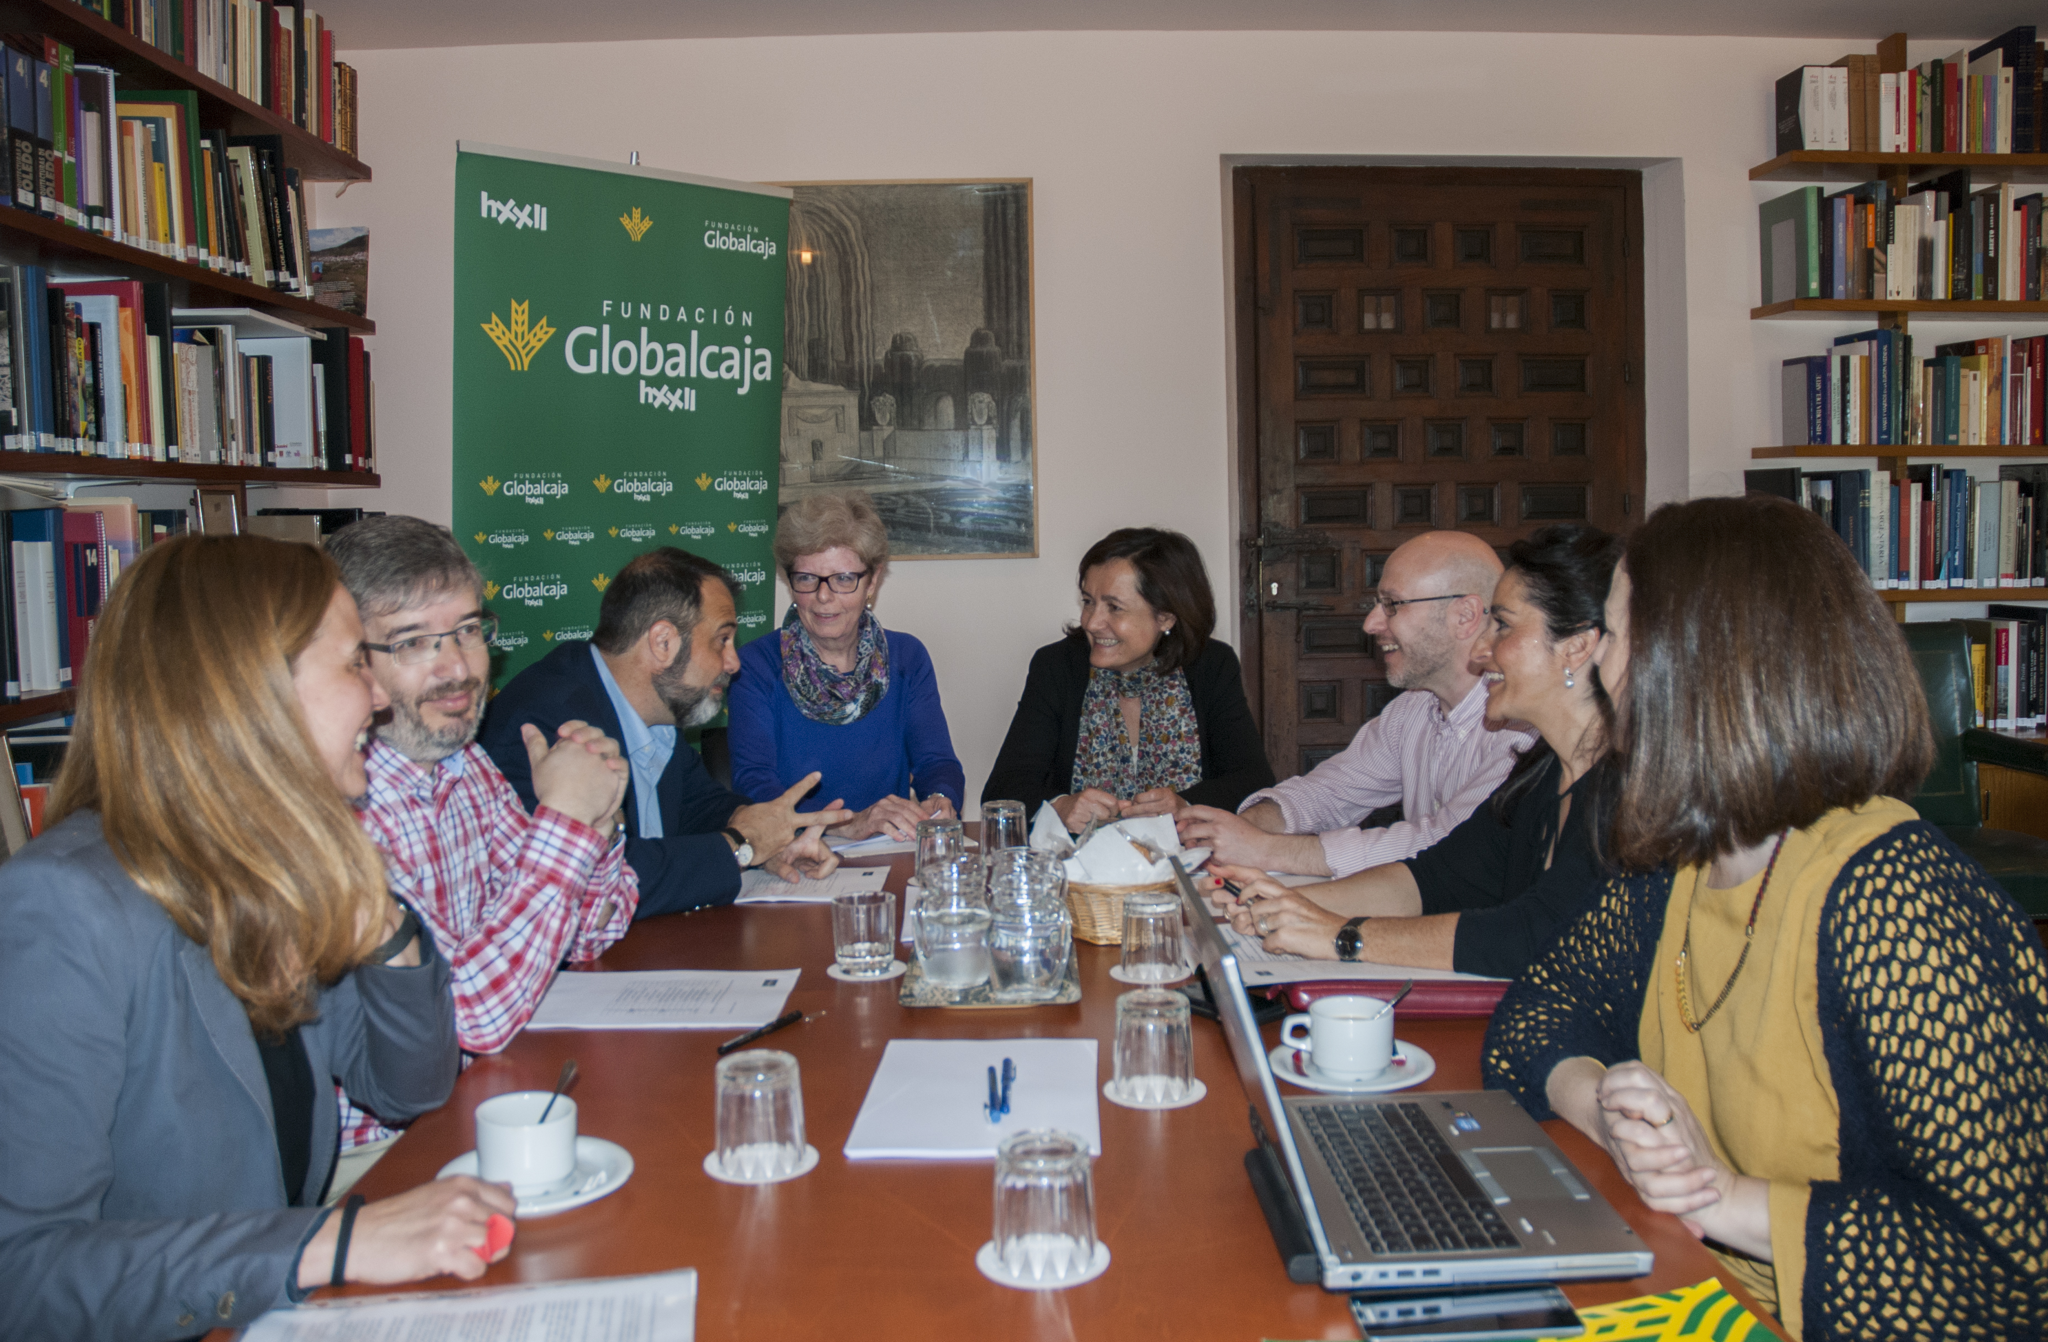 https://blog.globalcaja.es/wp-content/uploads/2018/04/Jurado-STH-1.jpg